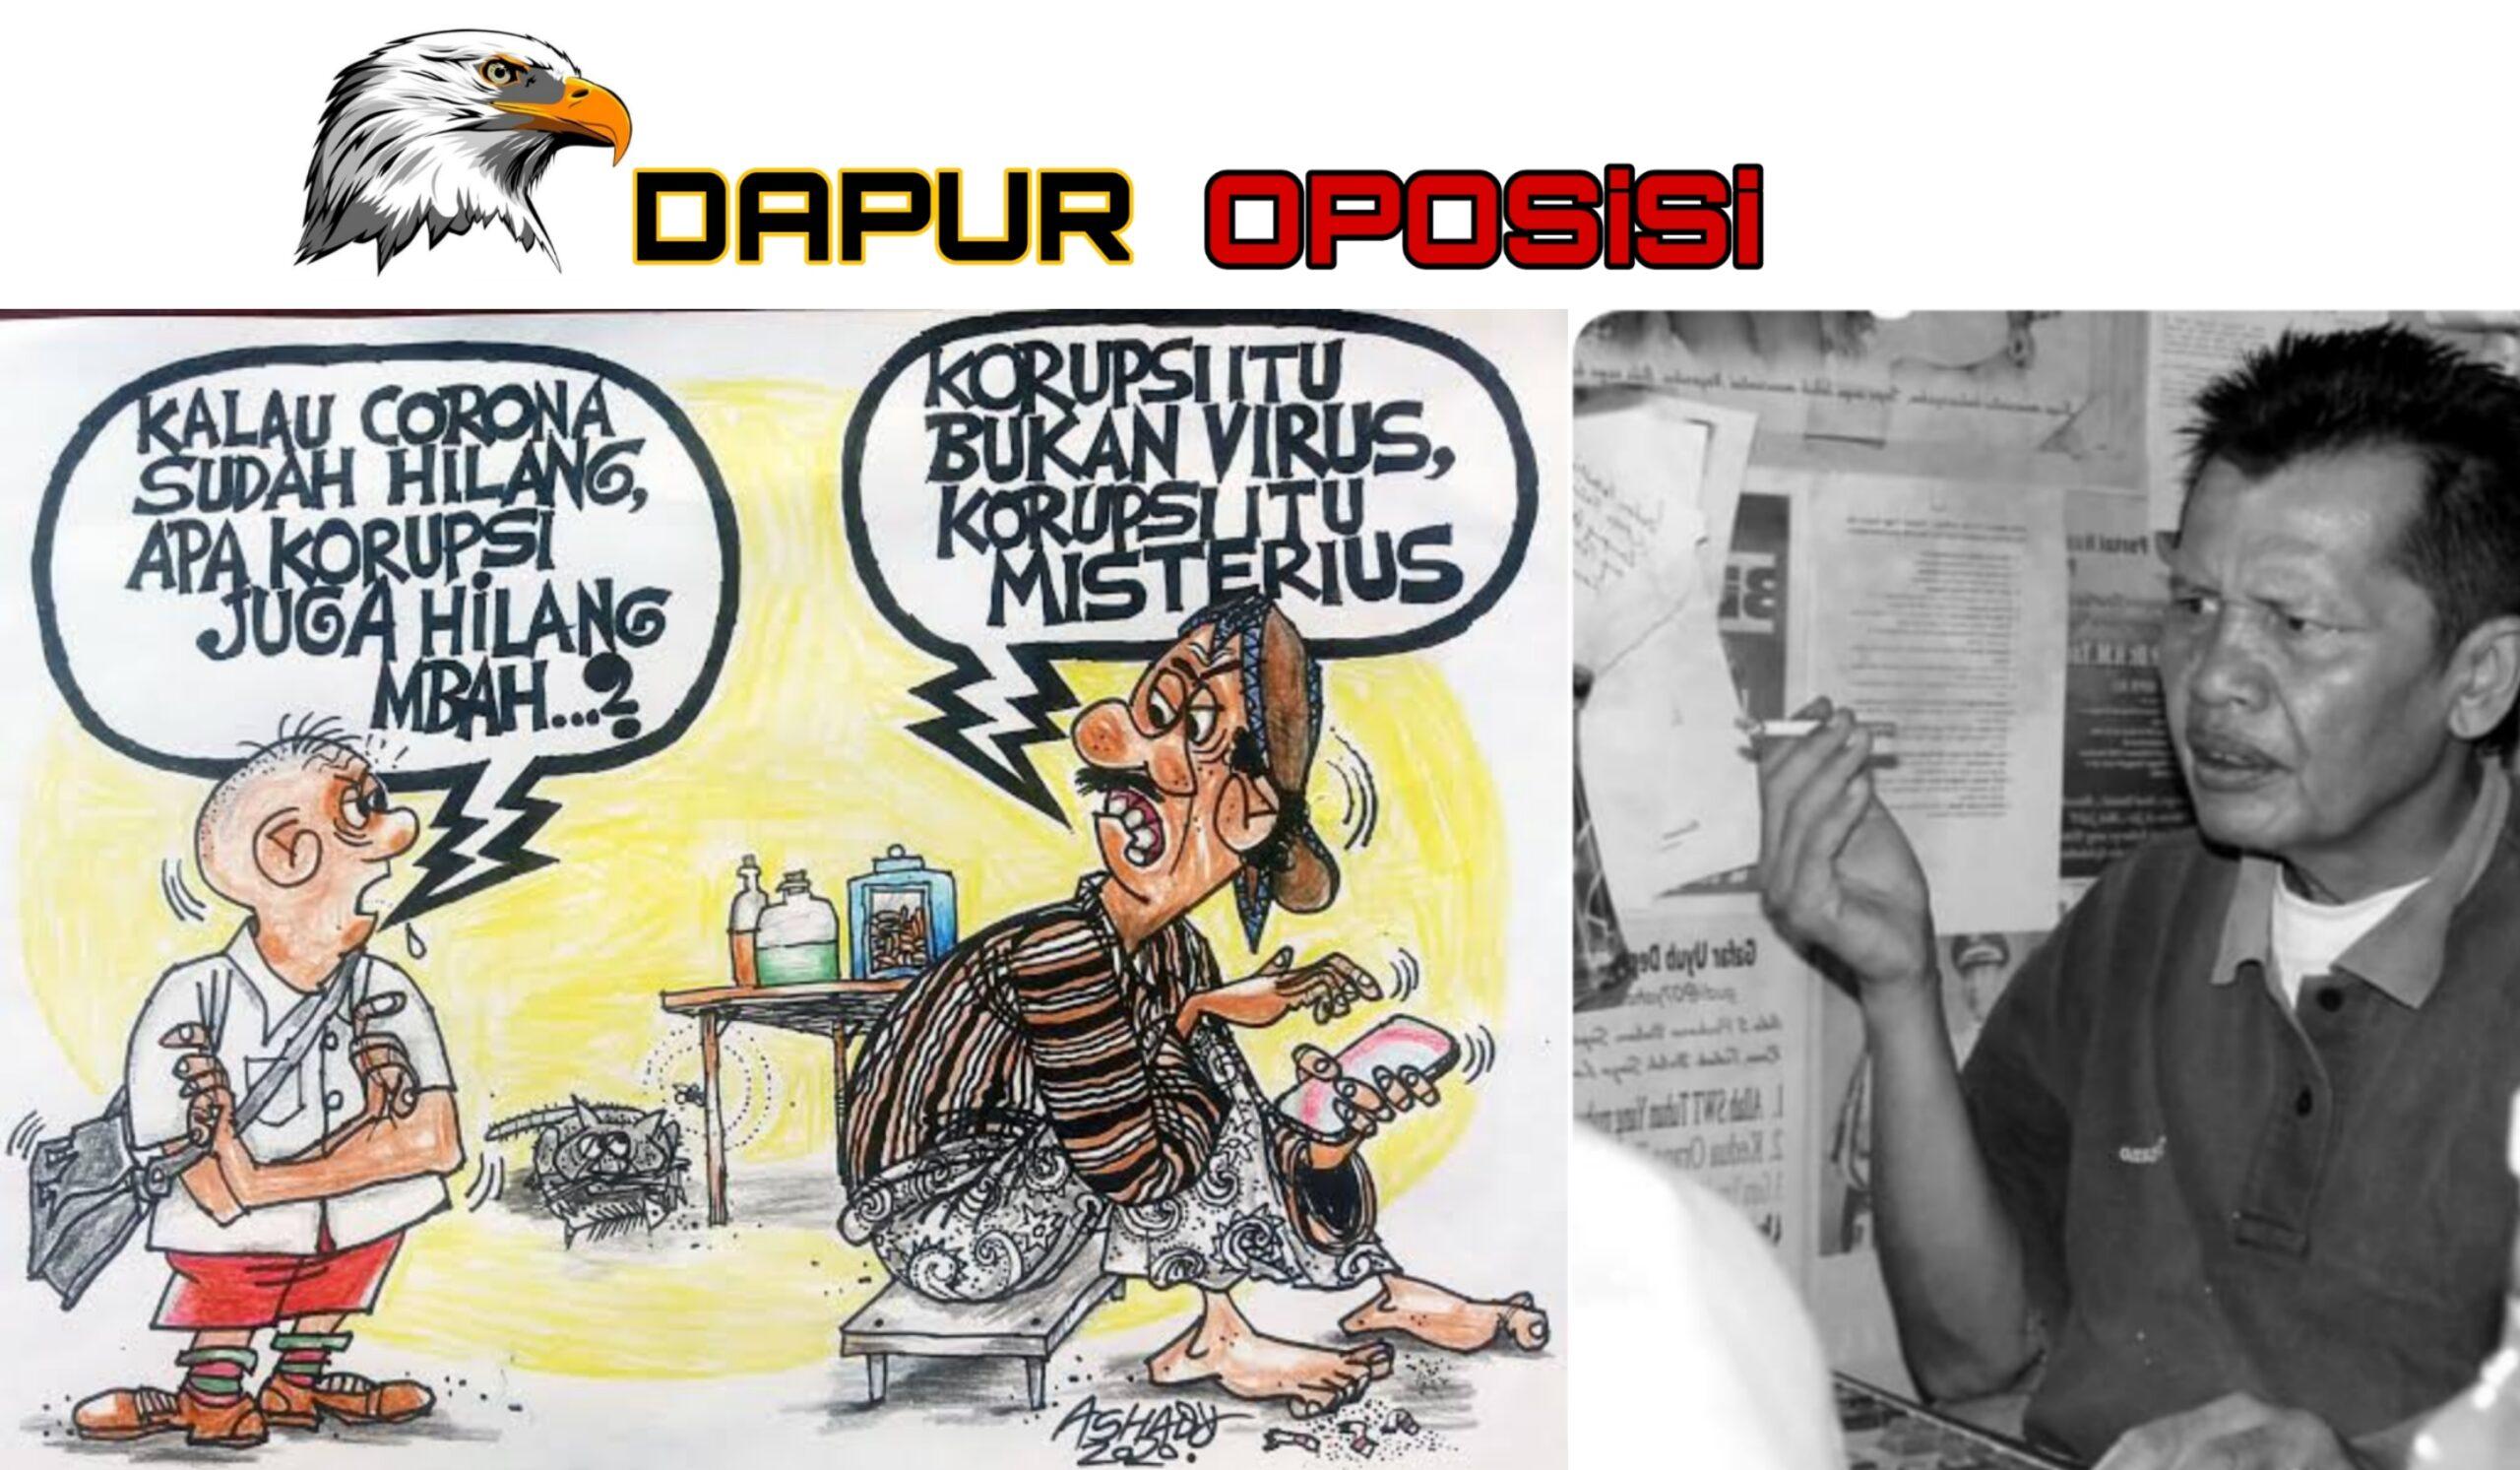 Koruptor Merusak Sistem Pemerintahan,Menyengsarakan Rakyat Harus Dibumi Hanguskan